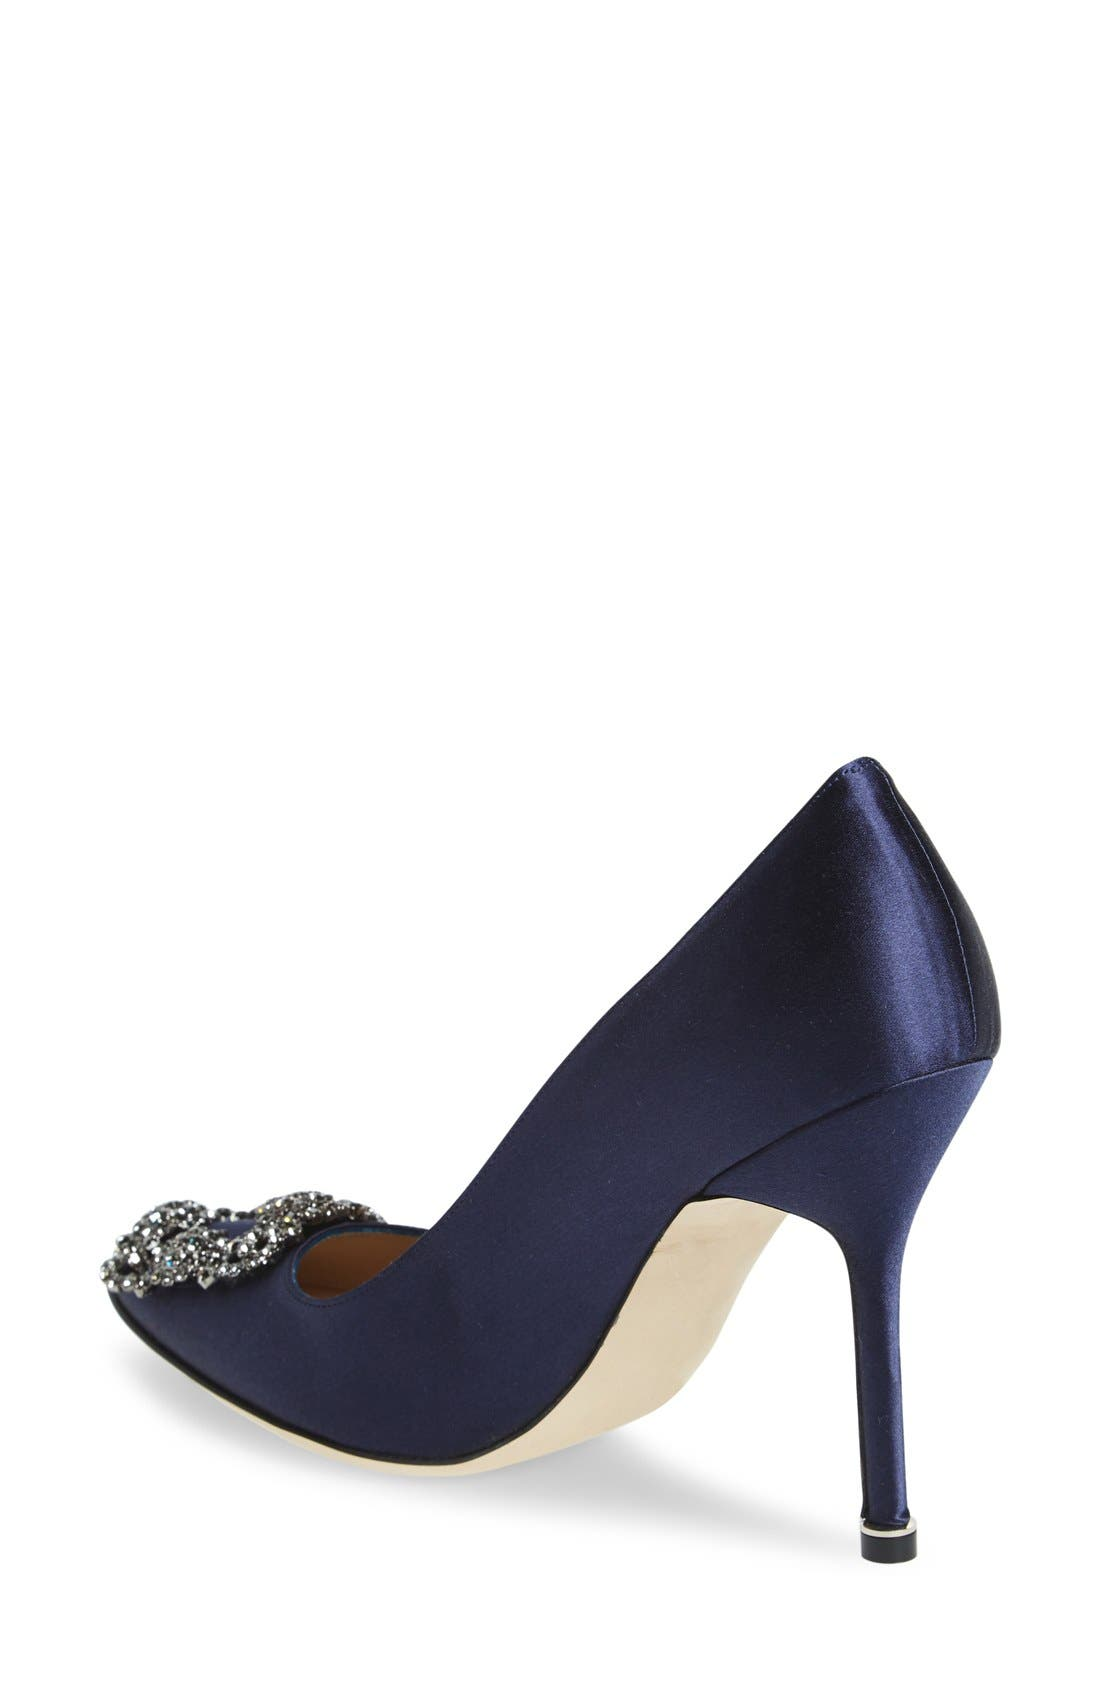 81e2675b549 Manolo Blahnik Women s Shoes